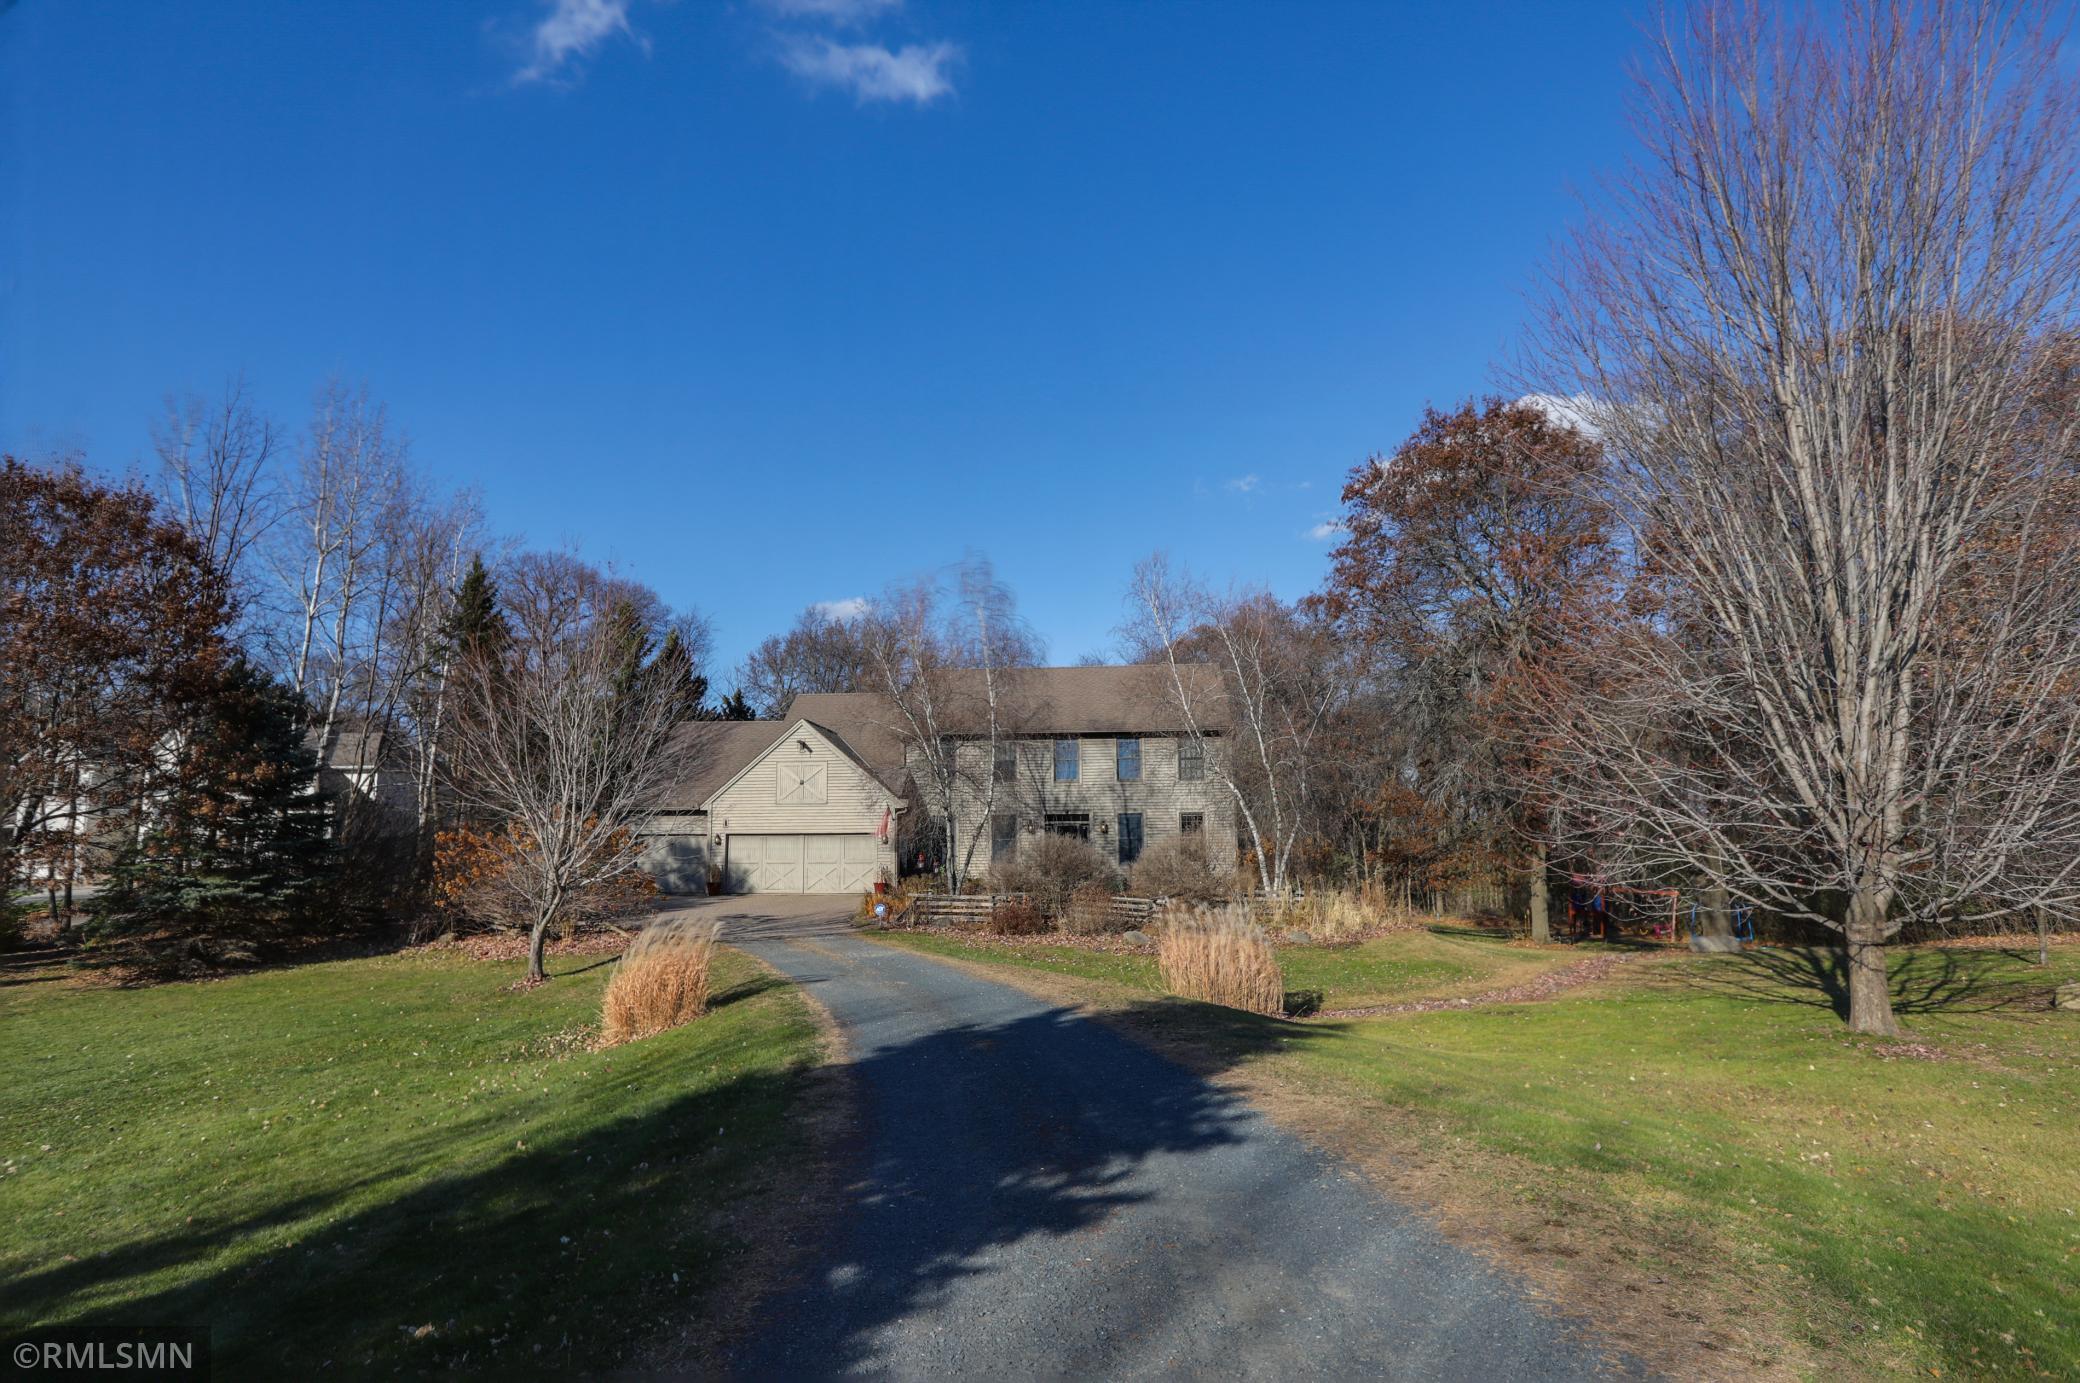 448 Highland View Property Photo - Saint Joseph Twp, WI real estate listing